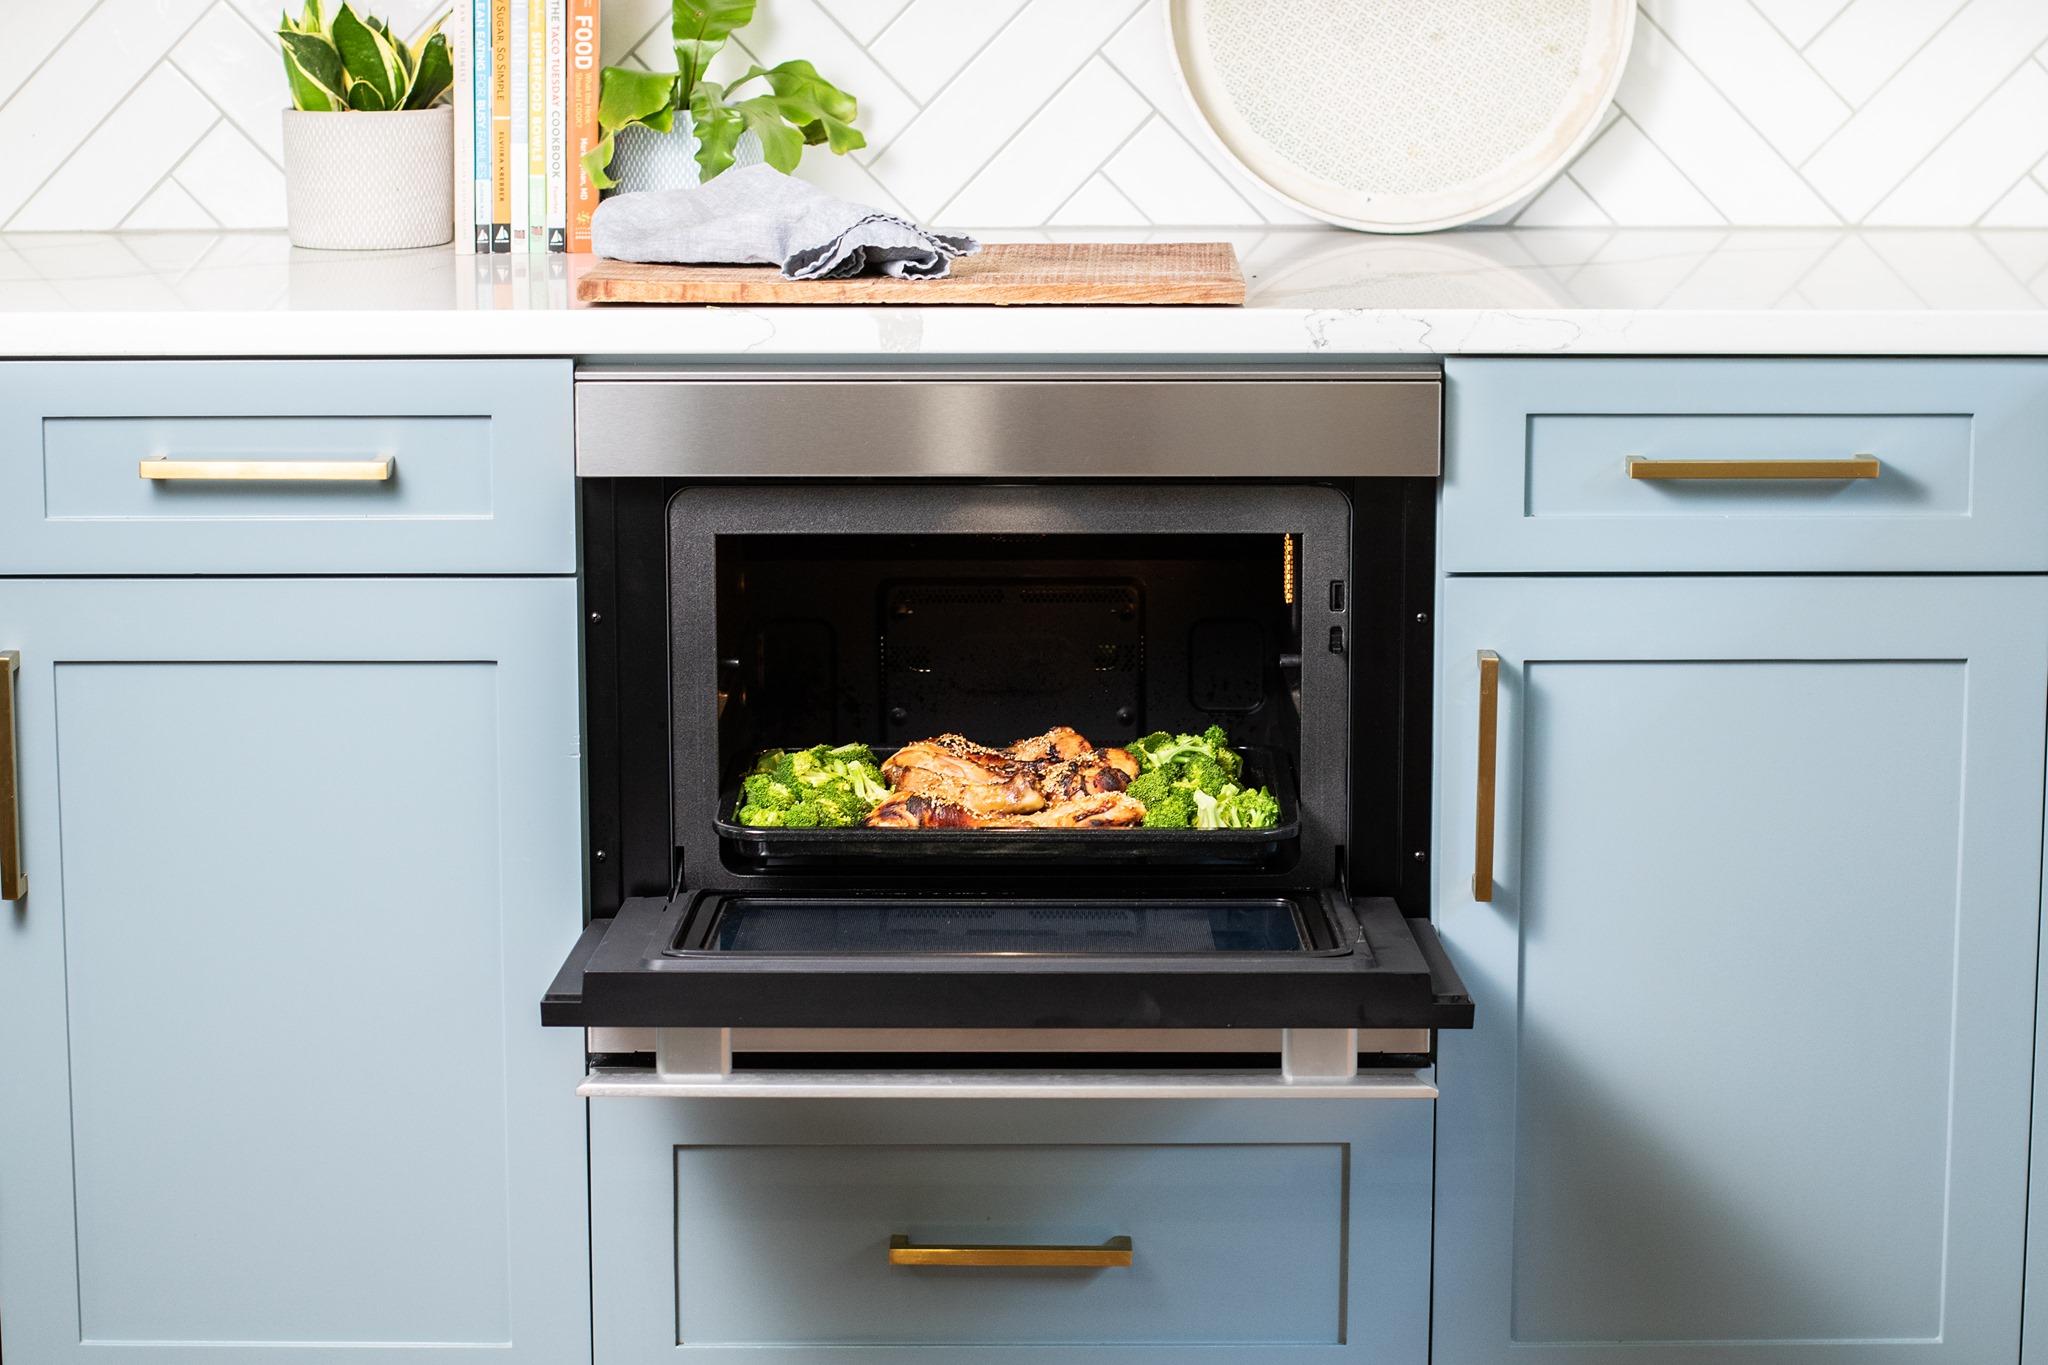 Sharp Appliances Multifunctionality